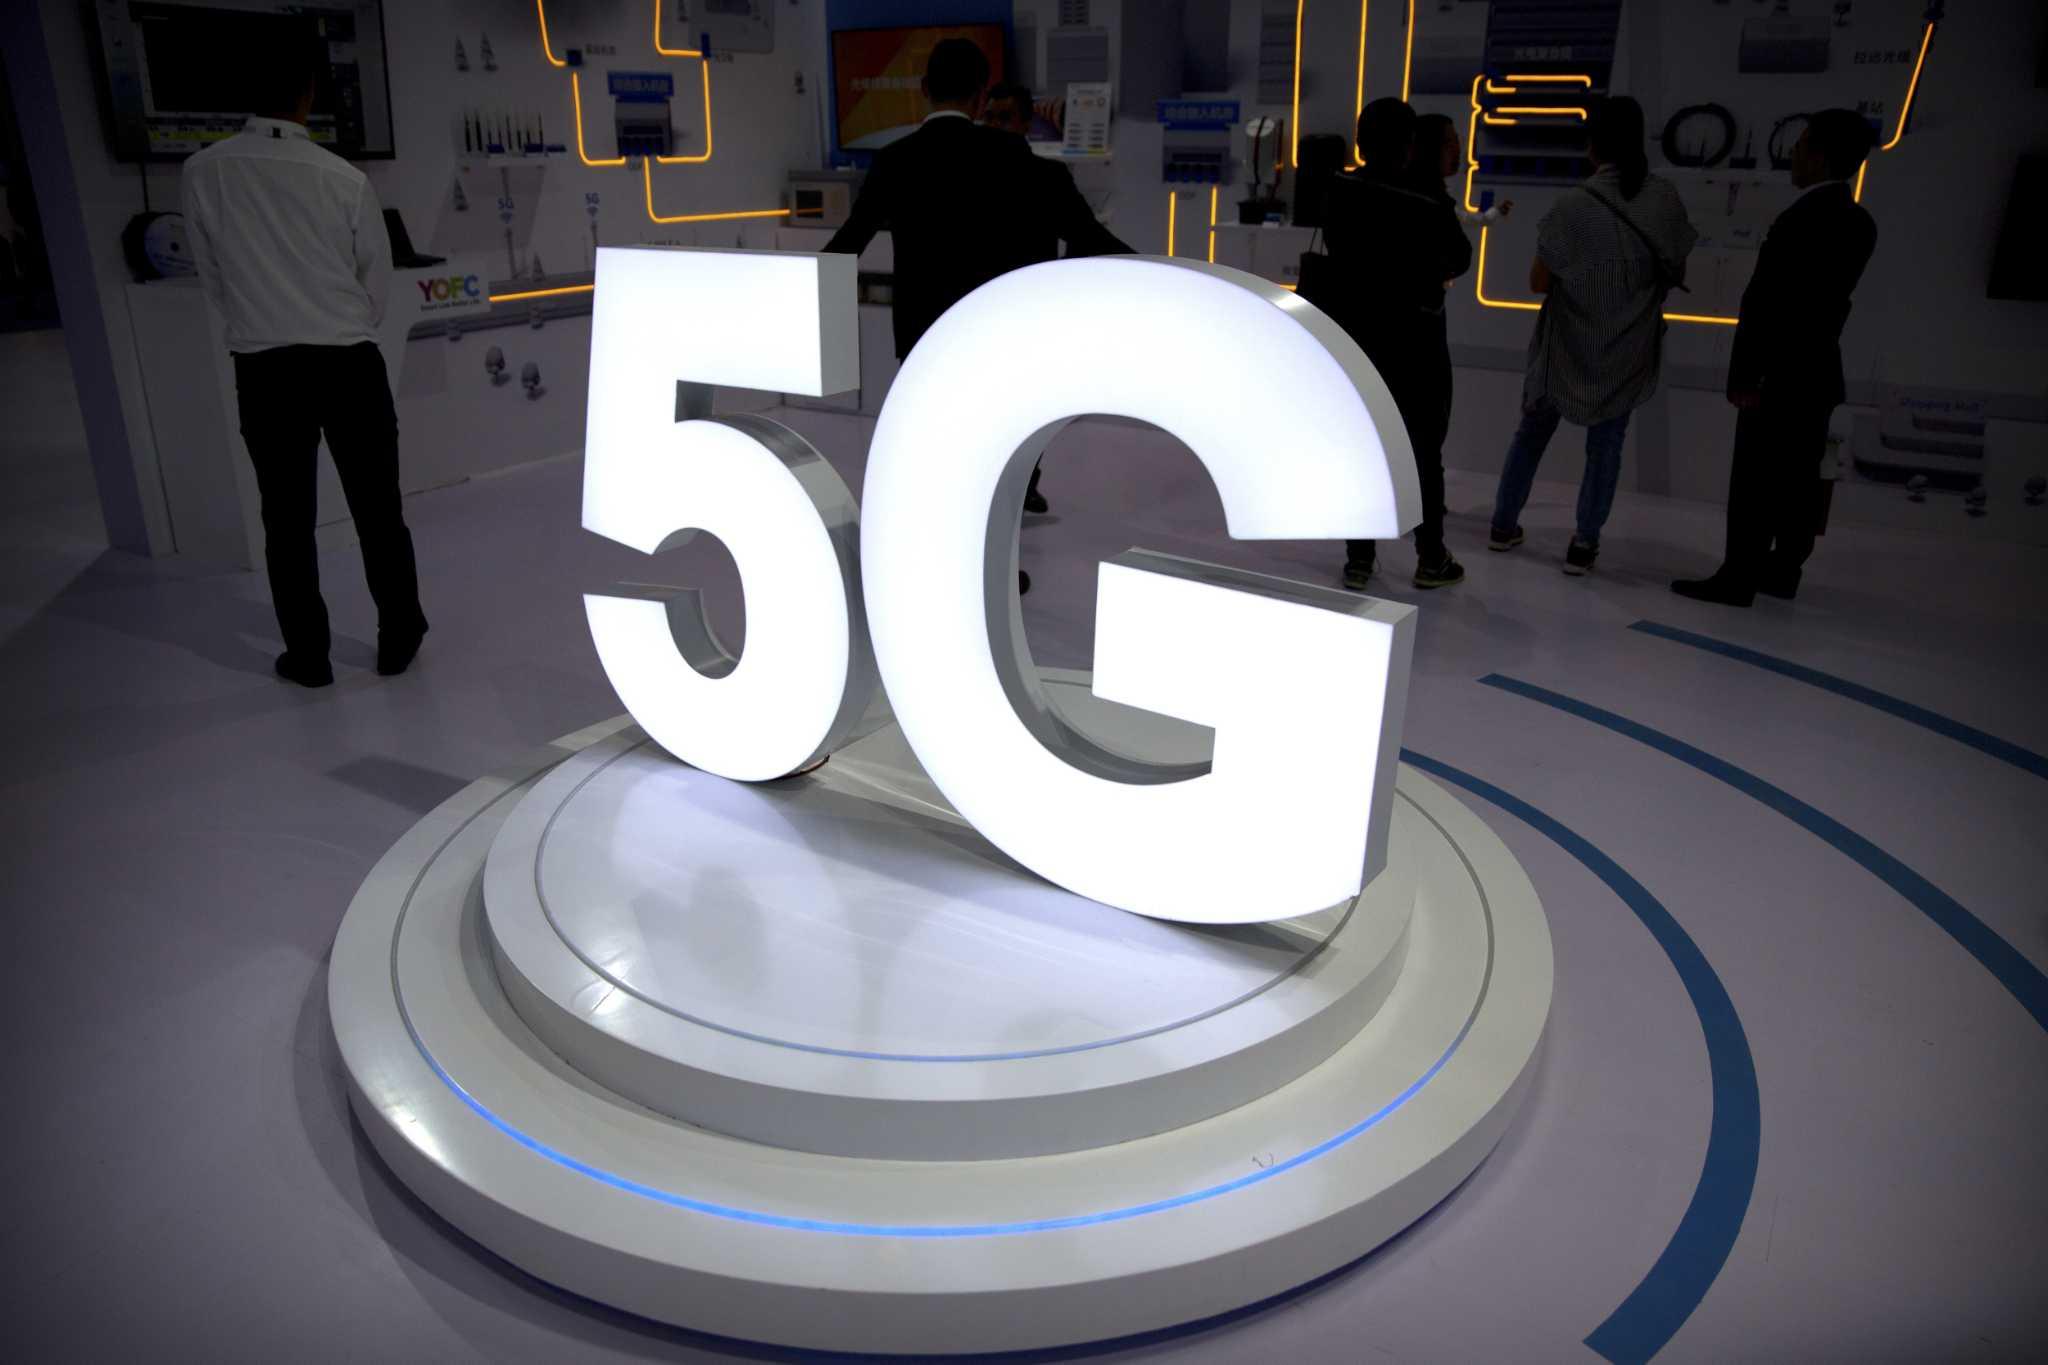 Apple Belum Niat Bikin Ponsel 5G hingga 2020, Samsung Diduga Bakal Melibas